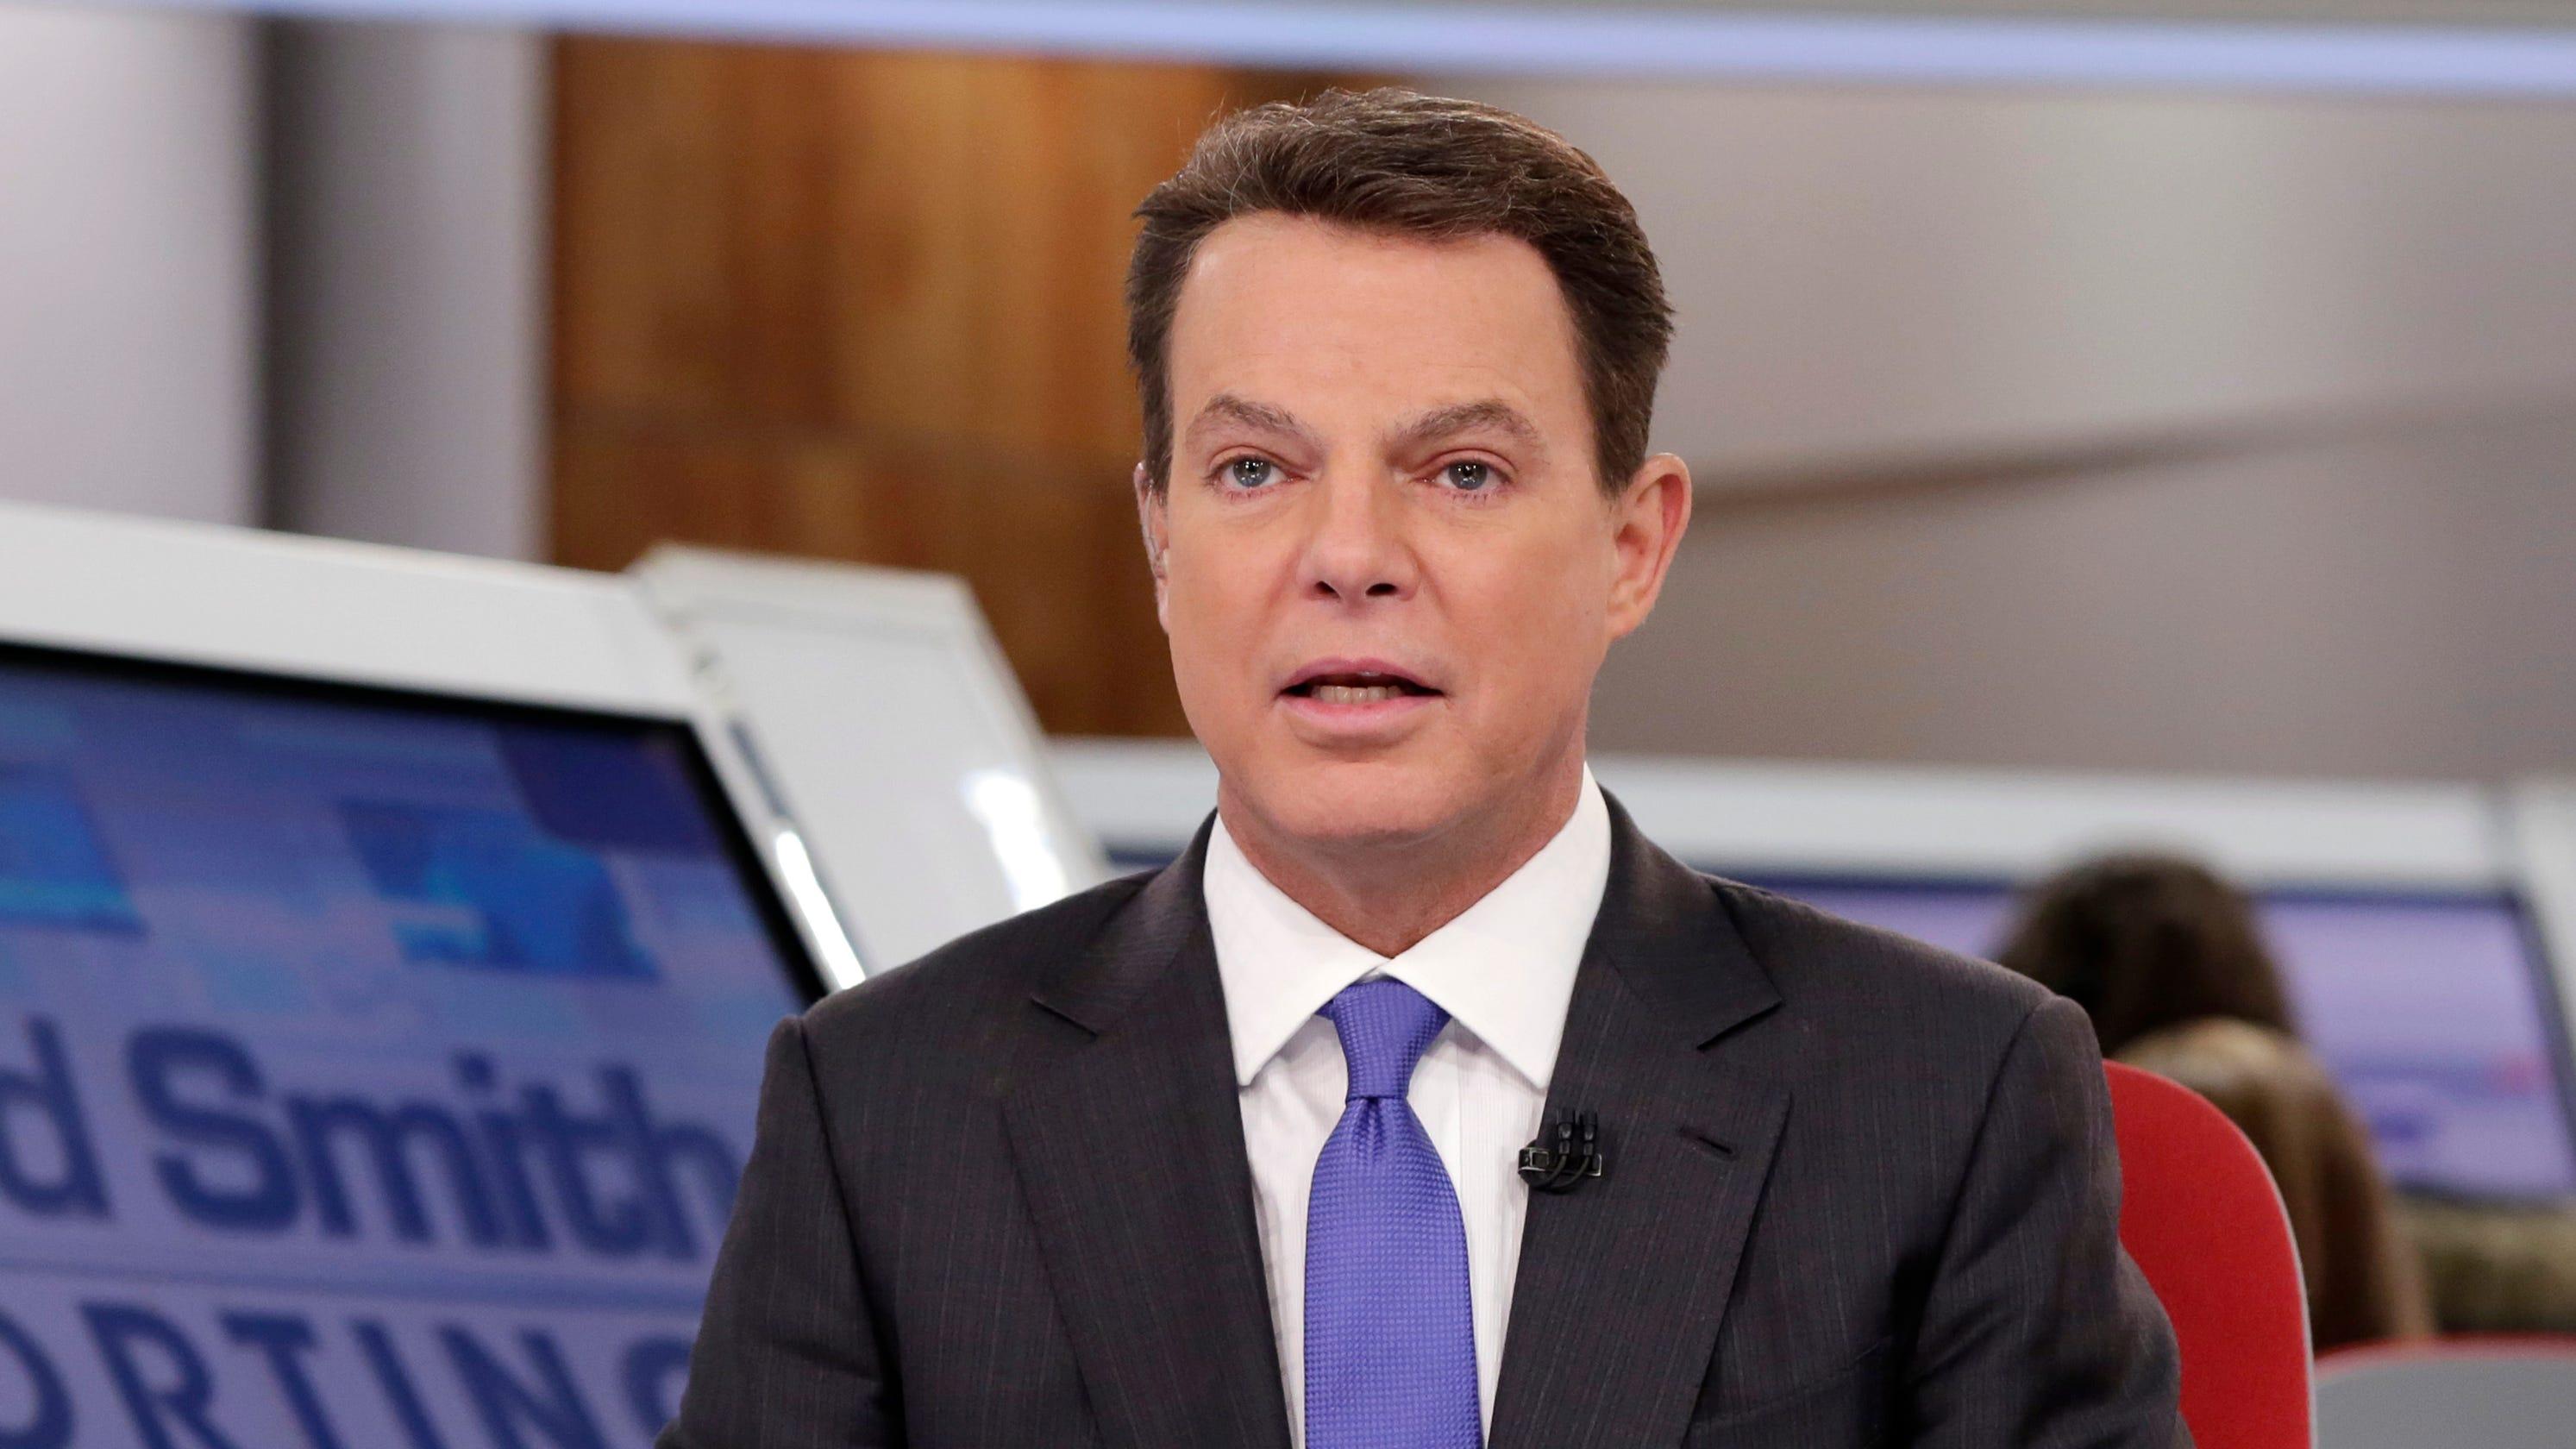 Tucker Carlson's Fox News colleague Shepard Smith on white